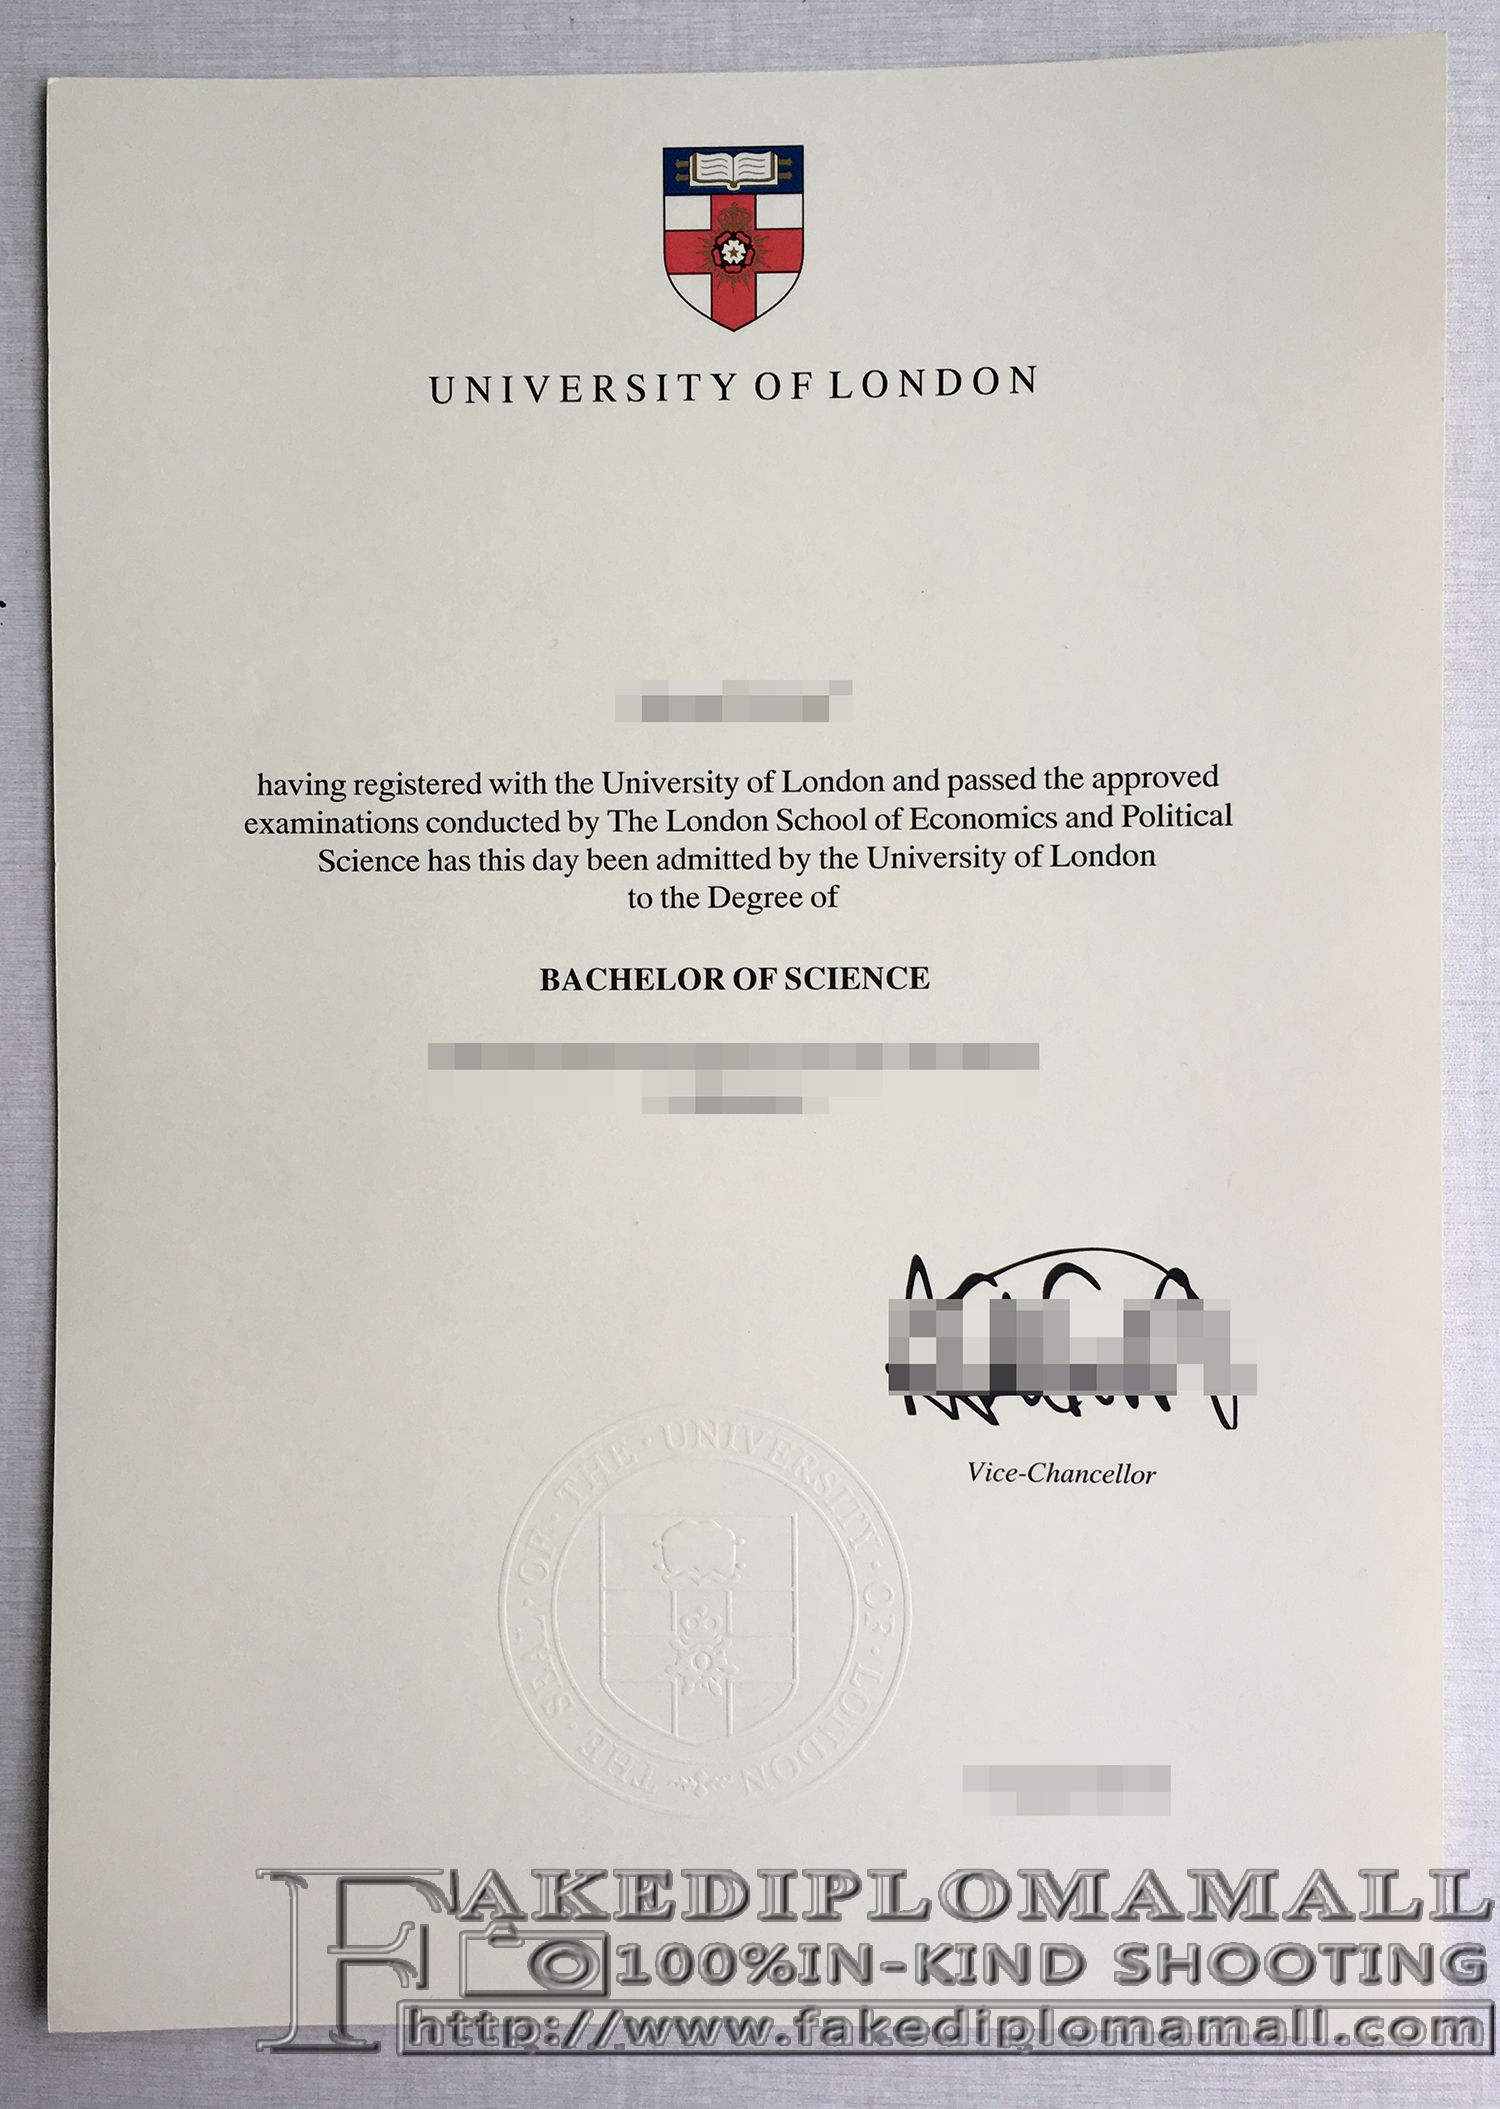 university of london fake degree buy university of london fake diploma lse fake degree